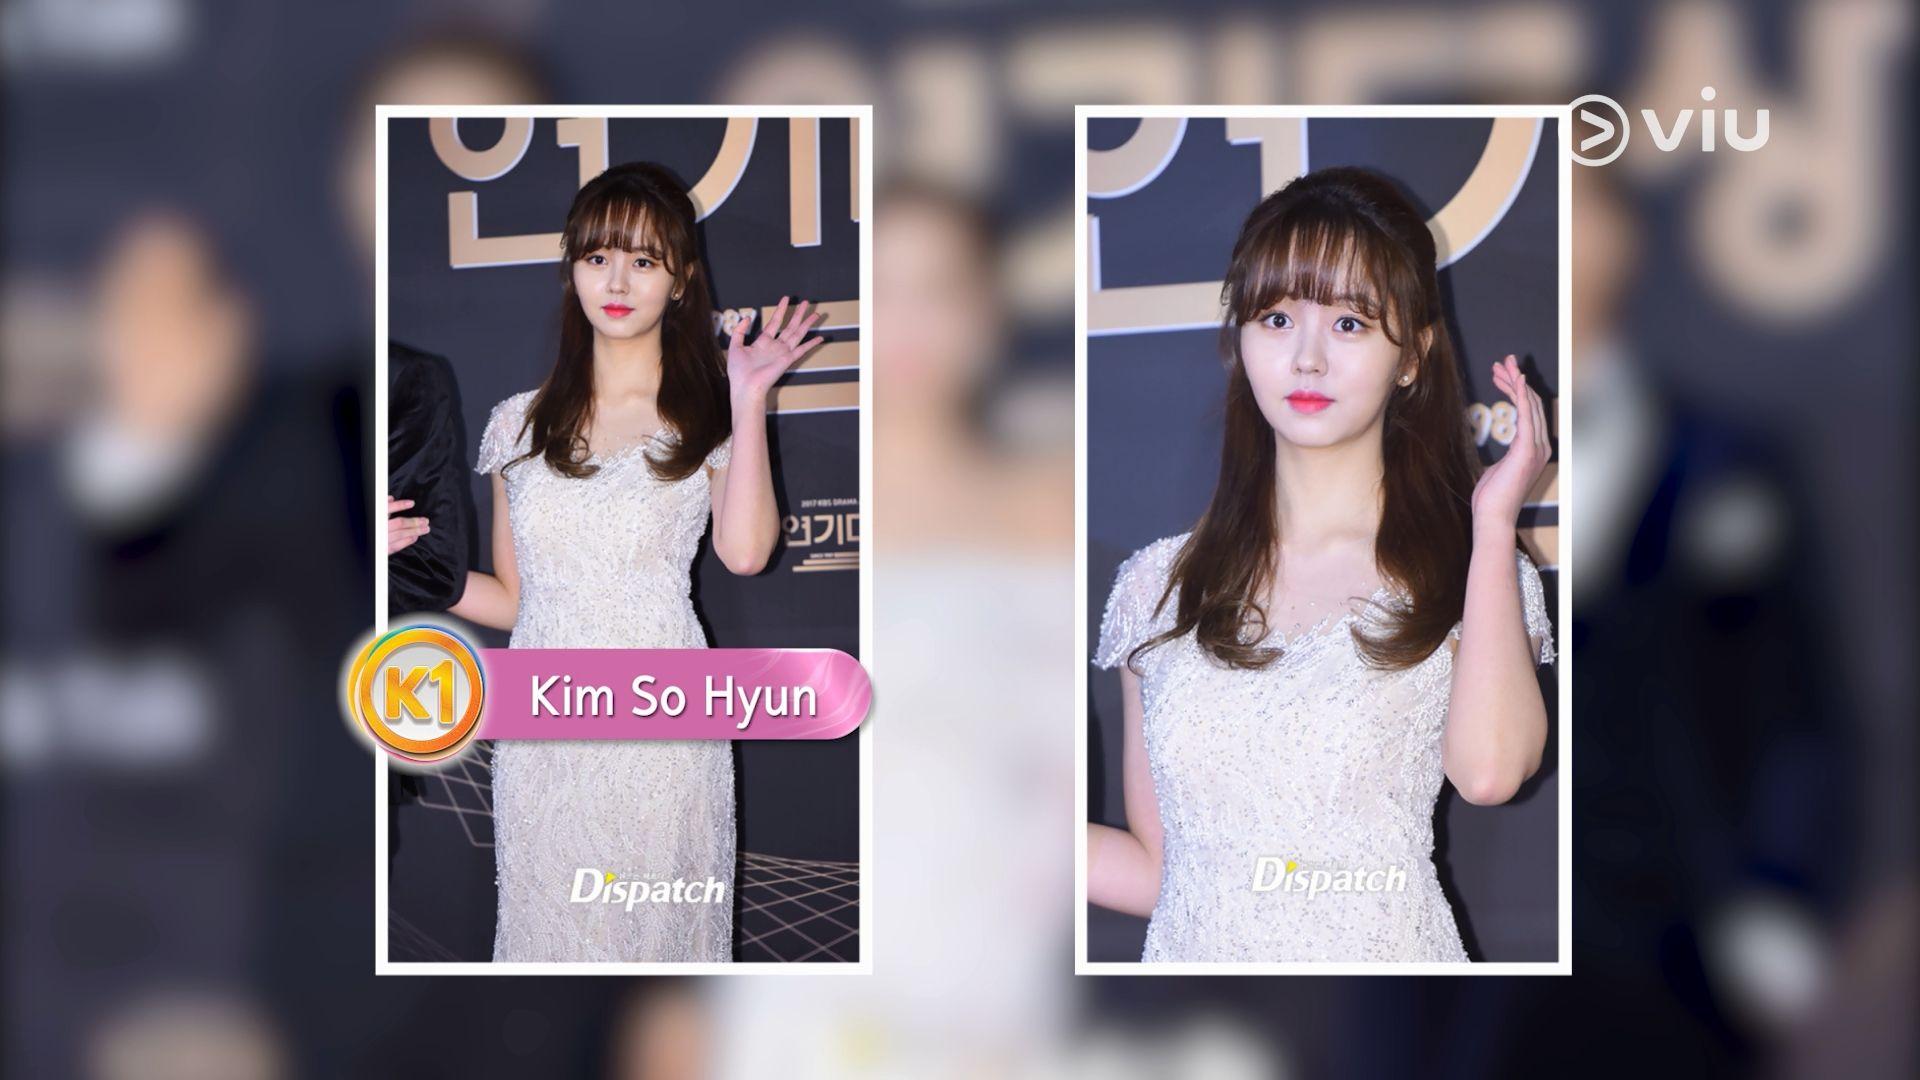 K1 Entertainment News|Episode 346|K1 Headlines|Viu